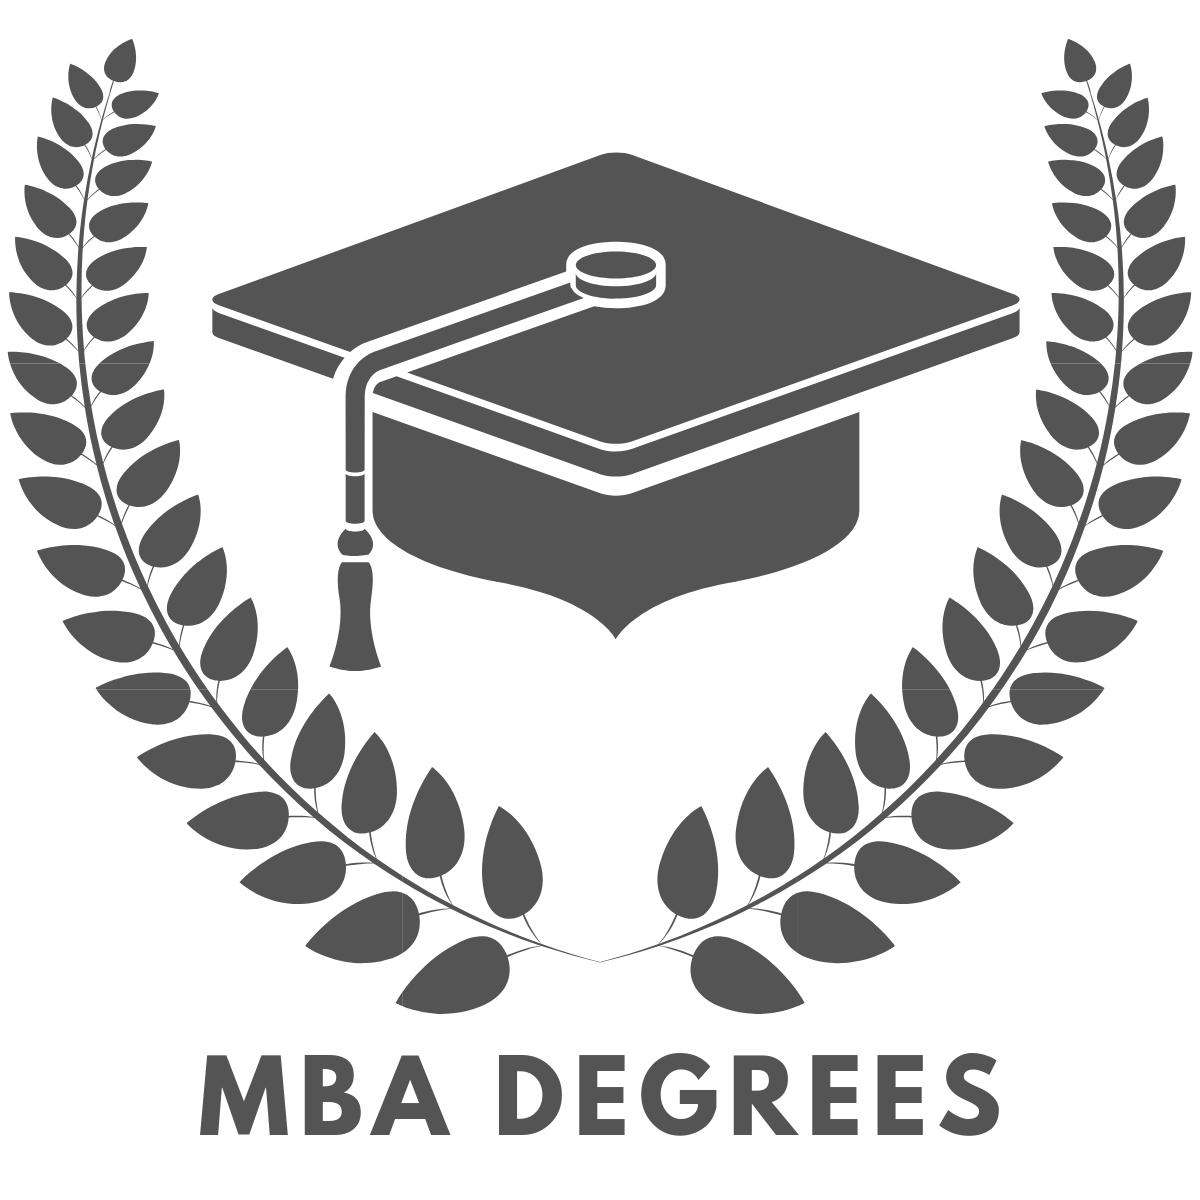 Mba Degrees